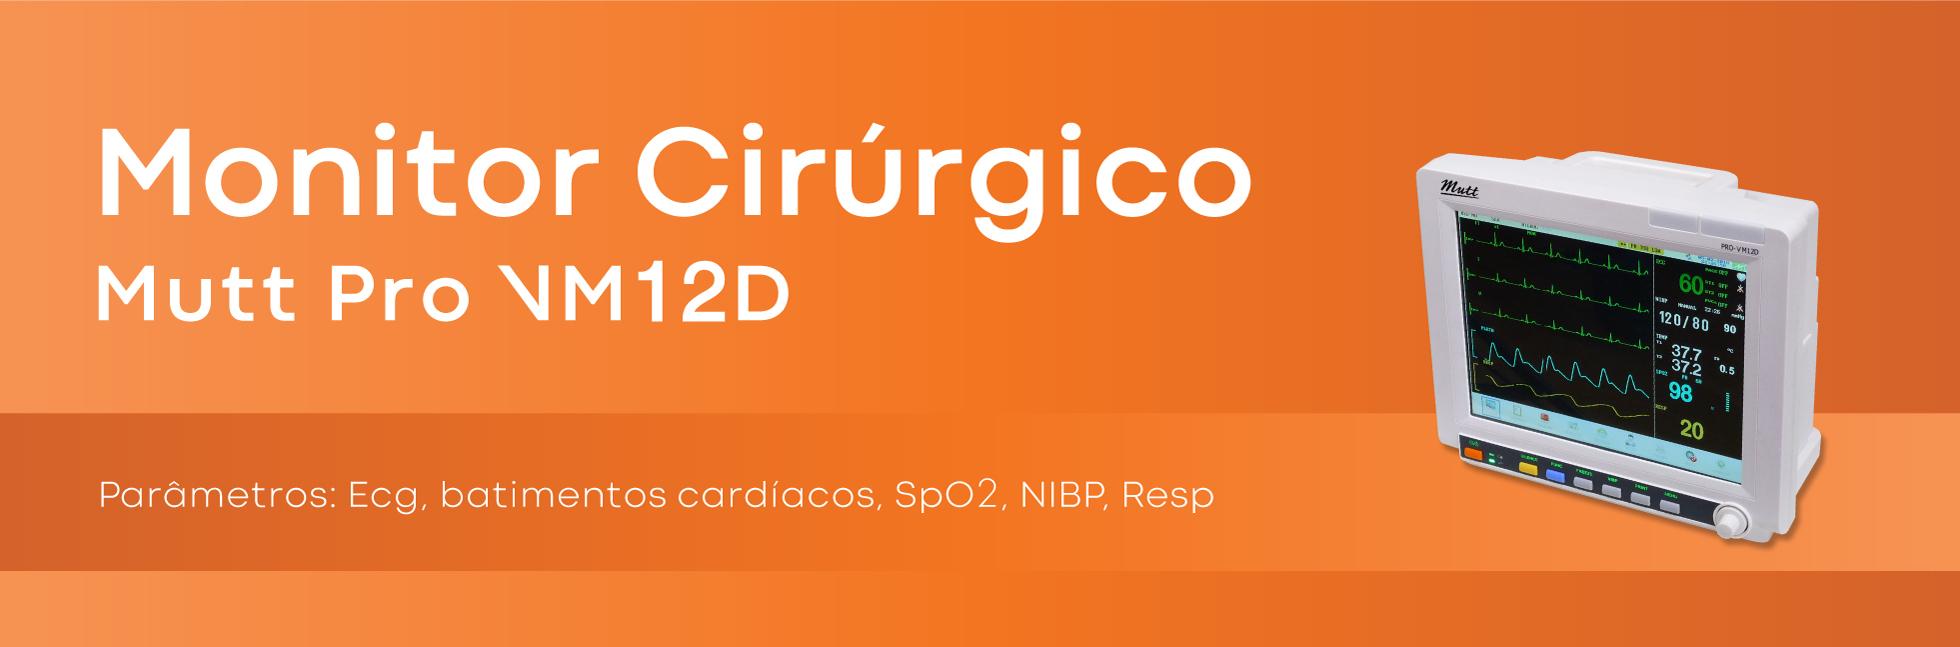 catalog/banners/PT_monitor-cirurgico.jpg